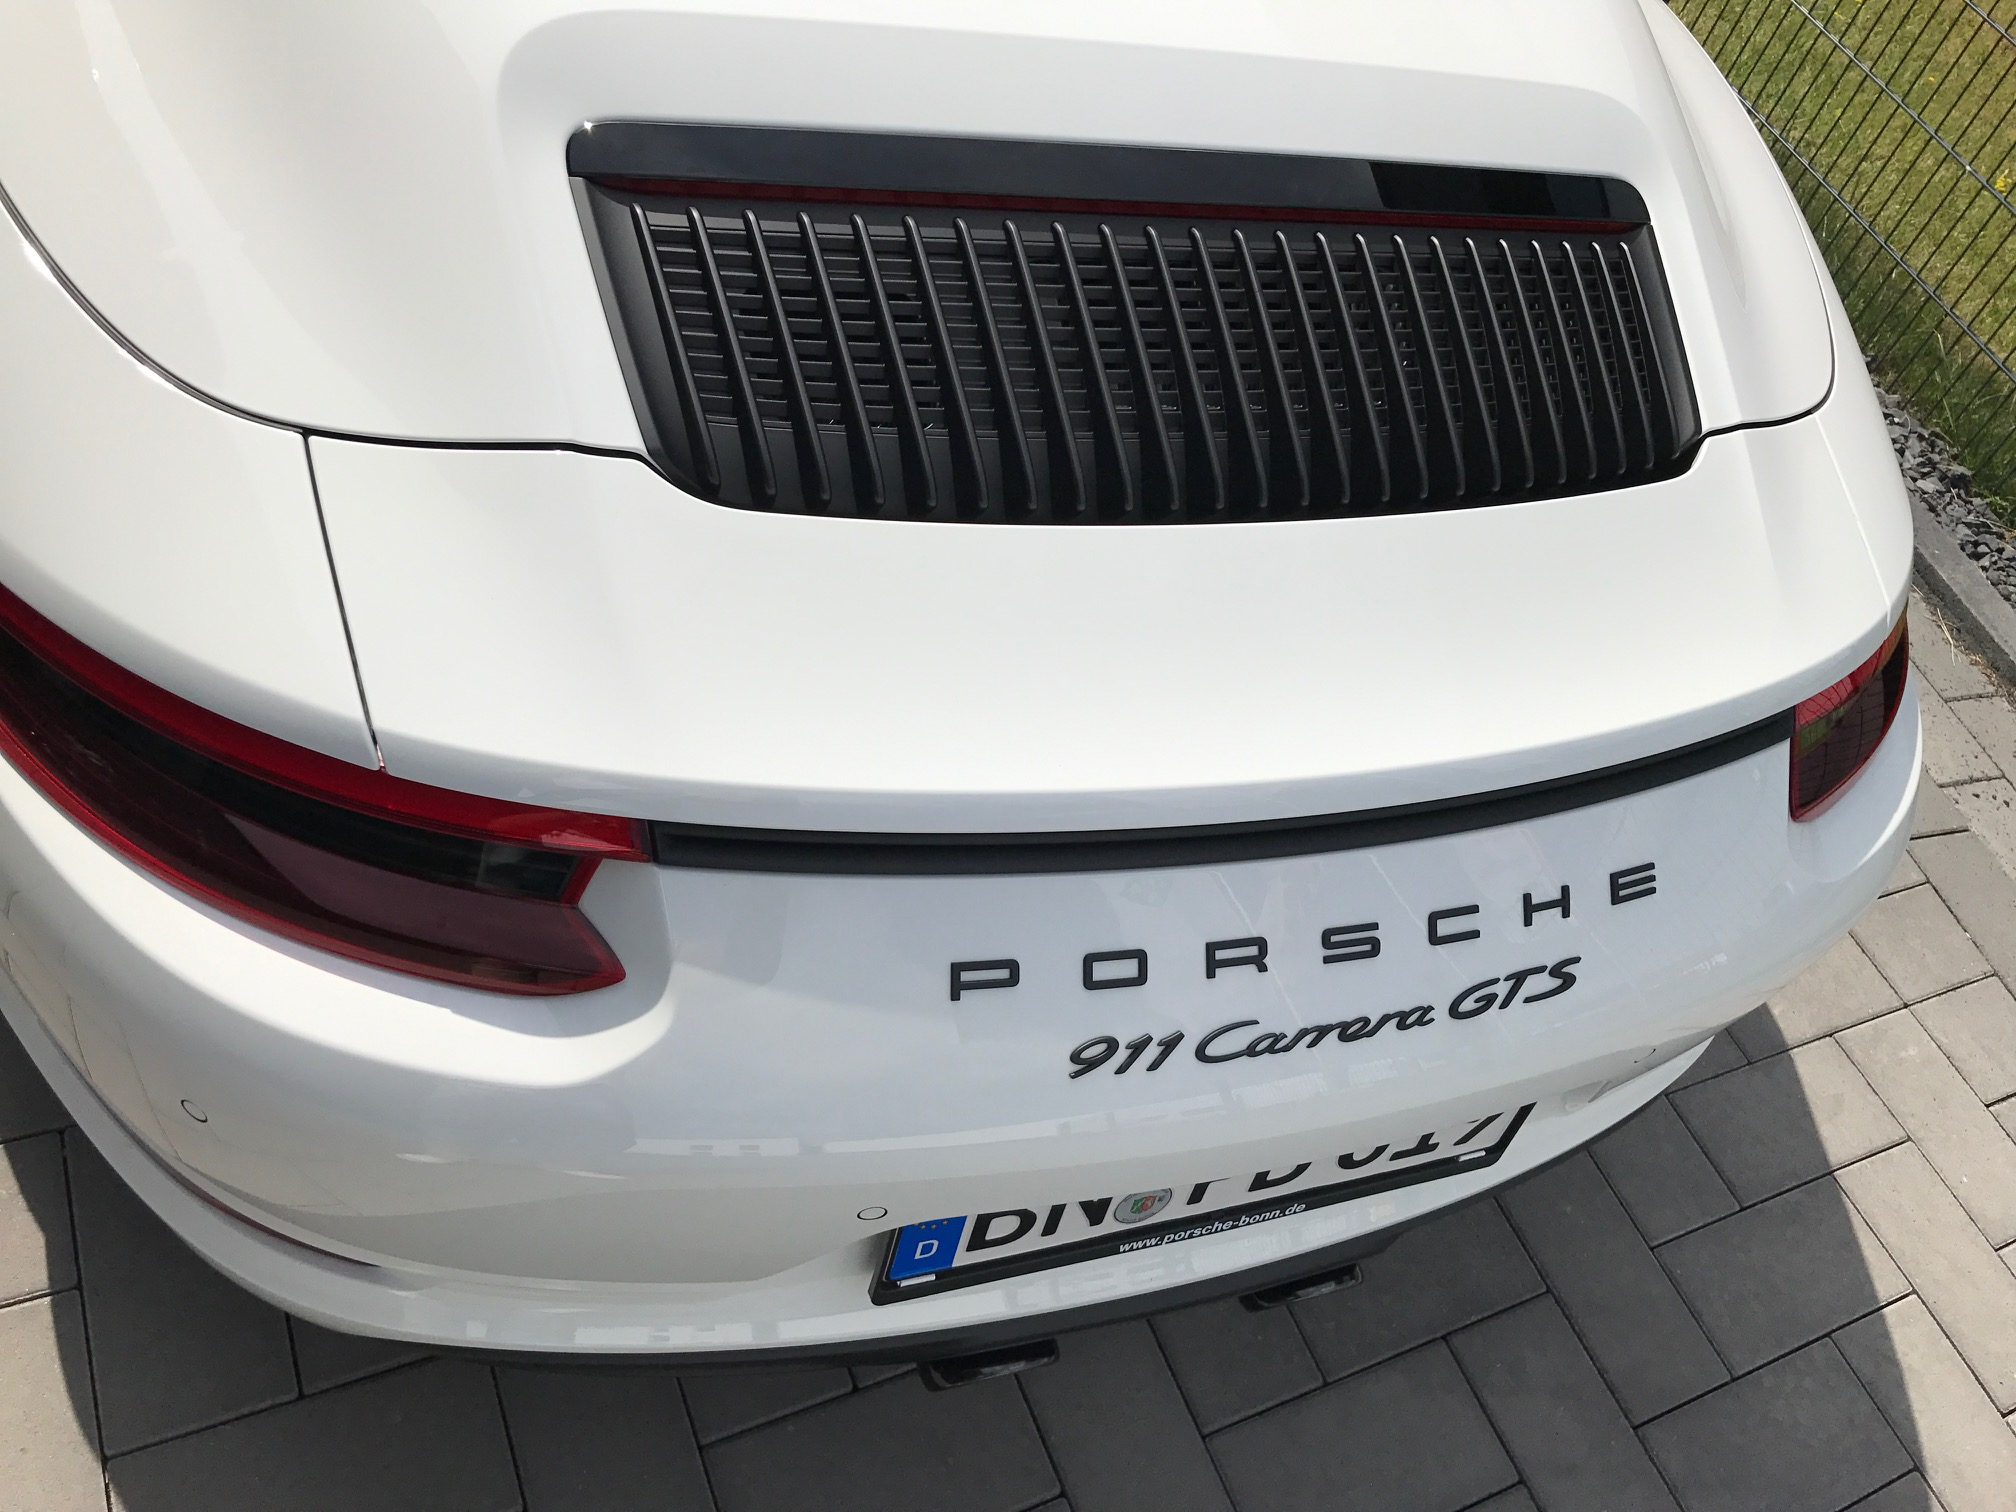 Passend für Porsche 991.2 911 GTS Coupe Cabrio Echt Carbon Heck Spoiler Heckspoiler